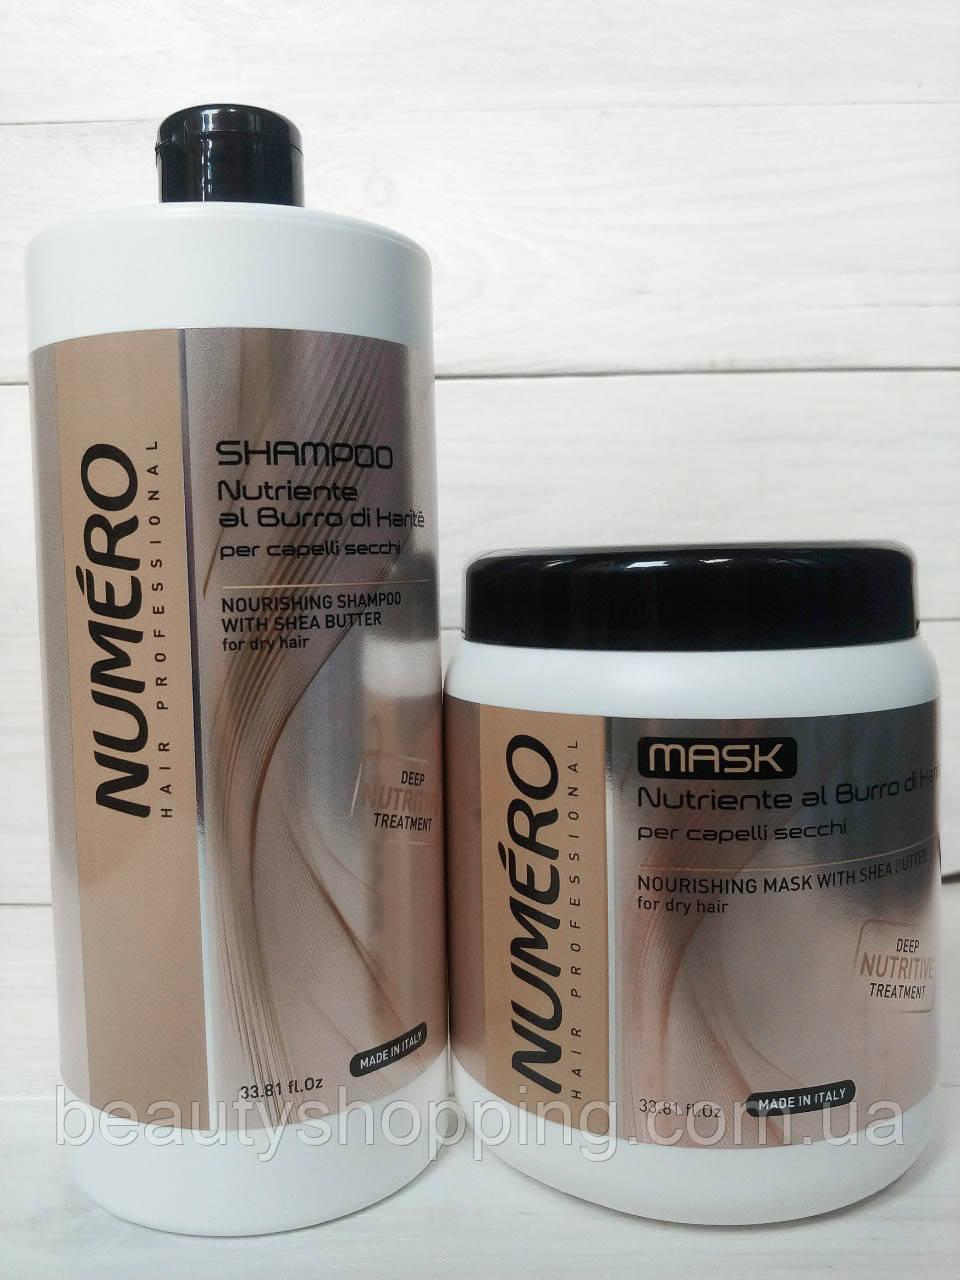 Brelil Hair Professional Numero маска и шампунь с маслом карите 1л Италия